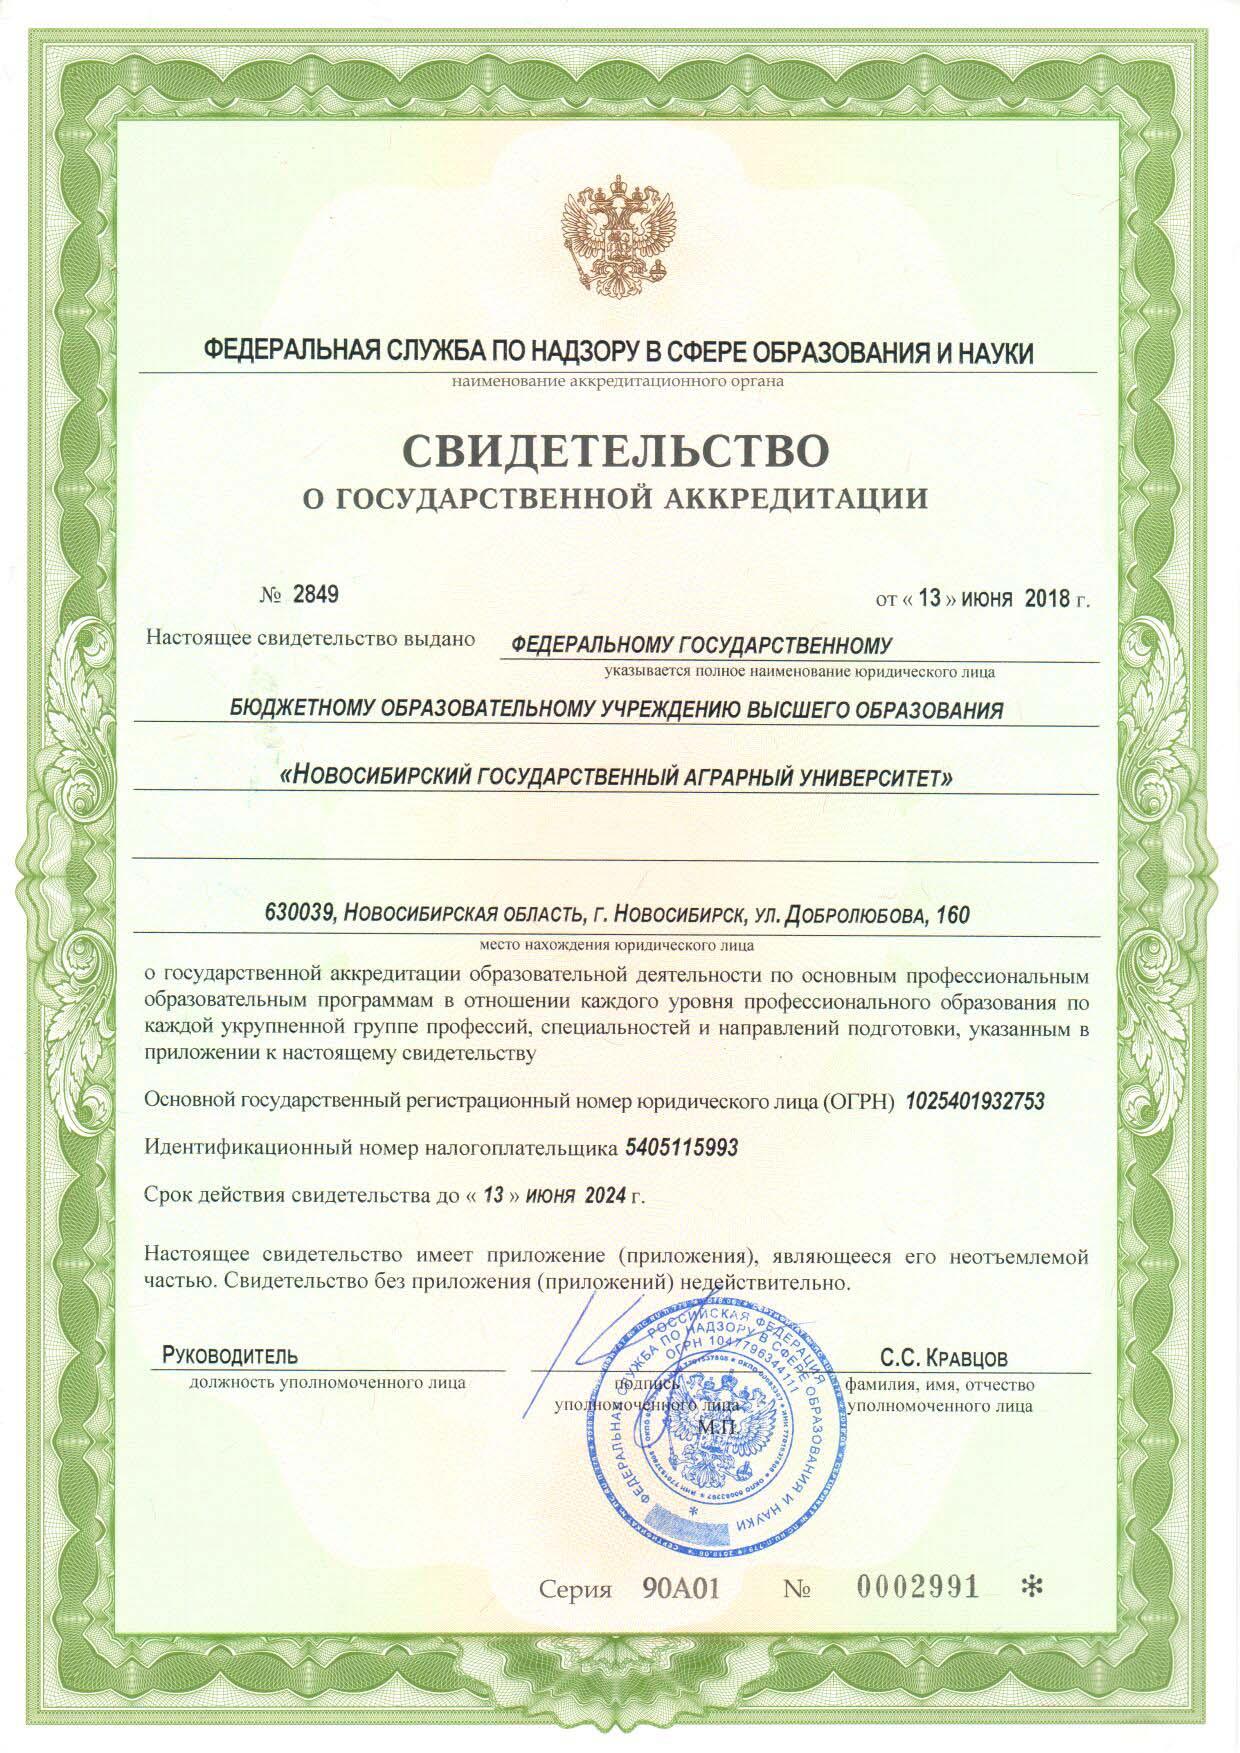 Государственная аккредитация, 2018 год